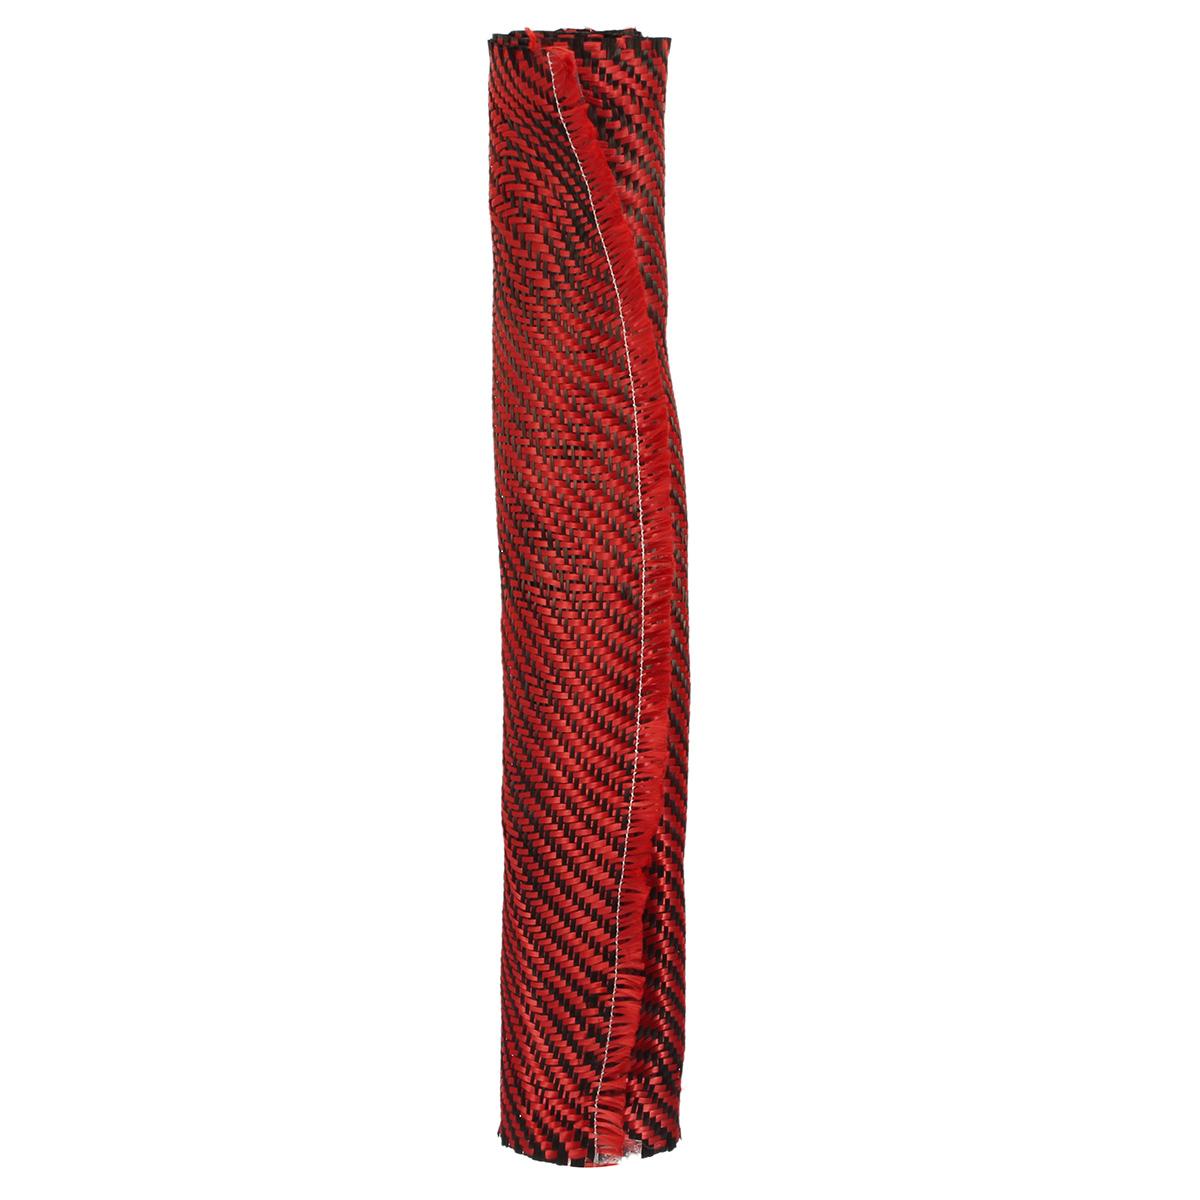 Carbon Fiber Black Red Kevlar Cloth Fabric Twill Weave Panel Sheet 200gsm